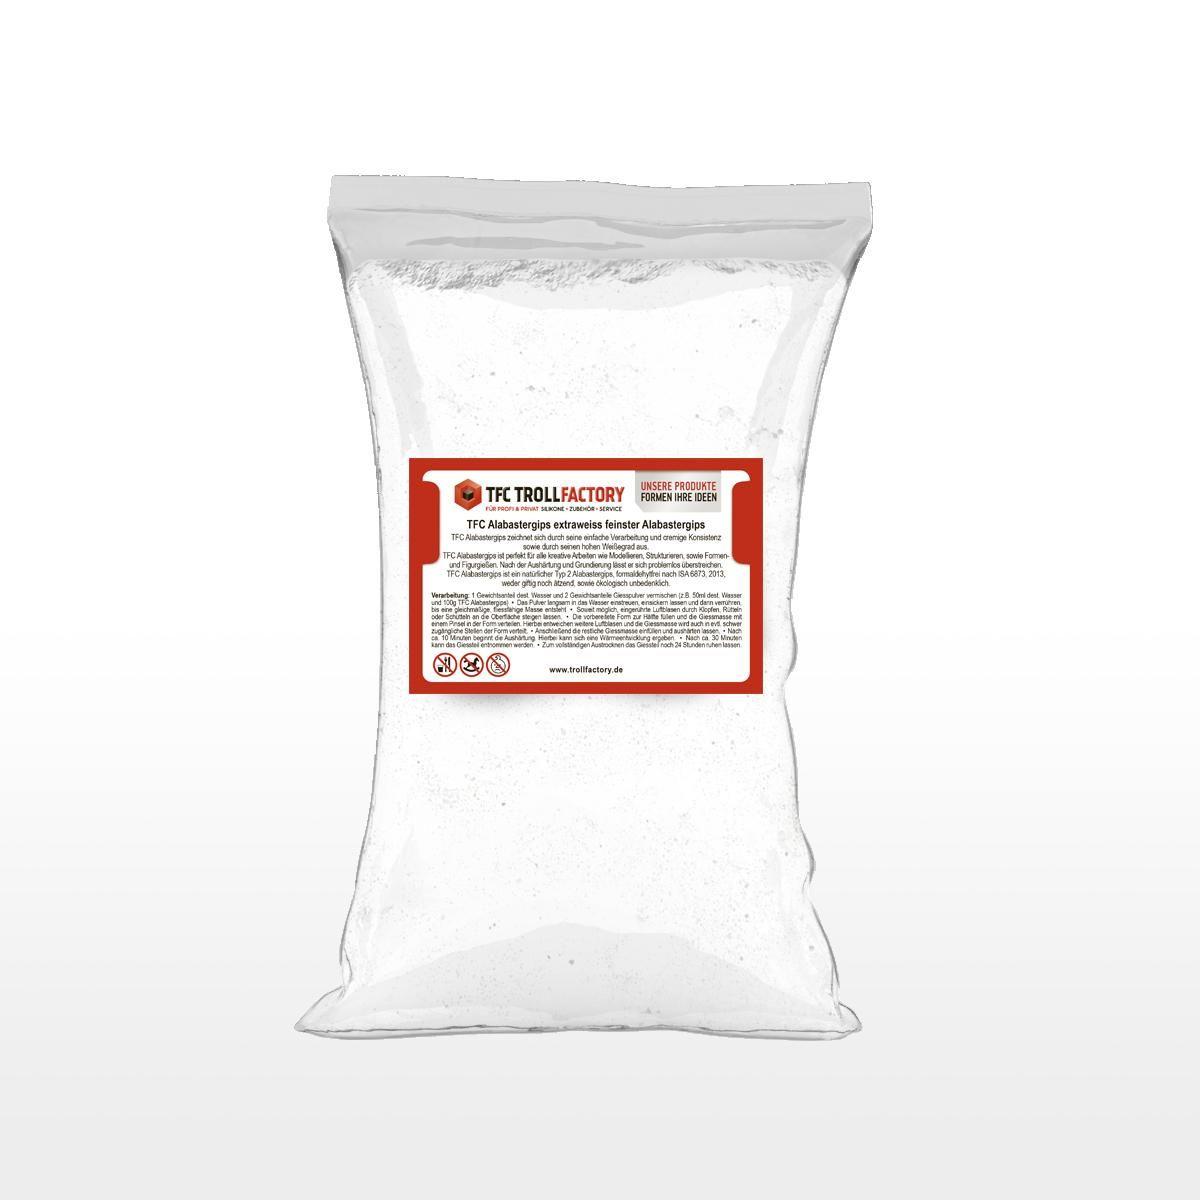 TFC Alabastergips extraweiss feinster Alabastergips 2:1 25kg